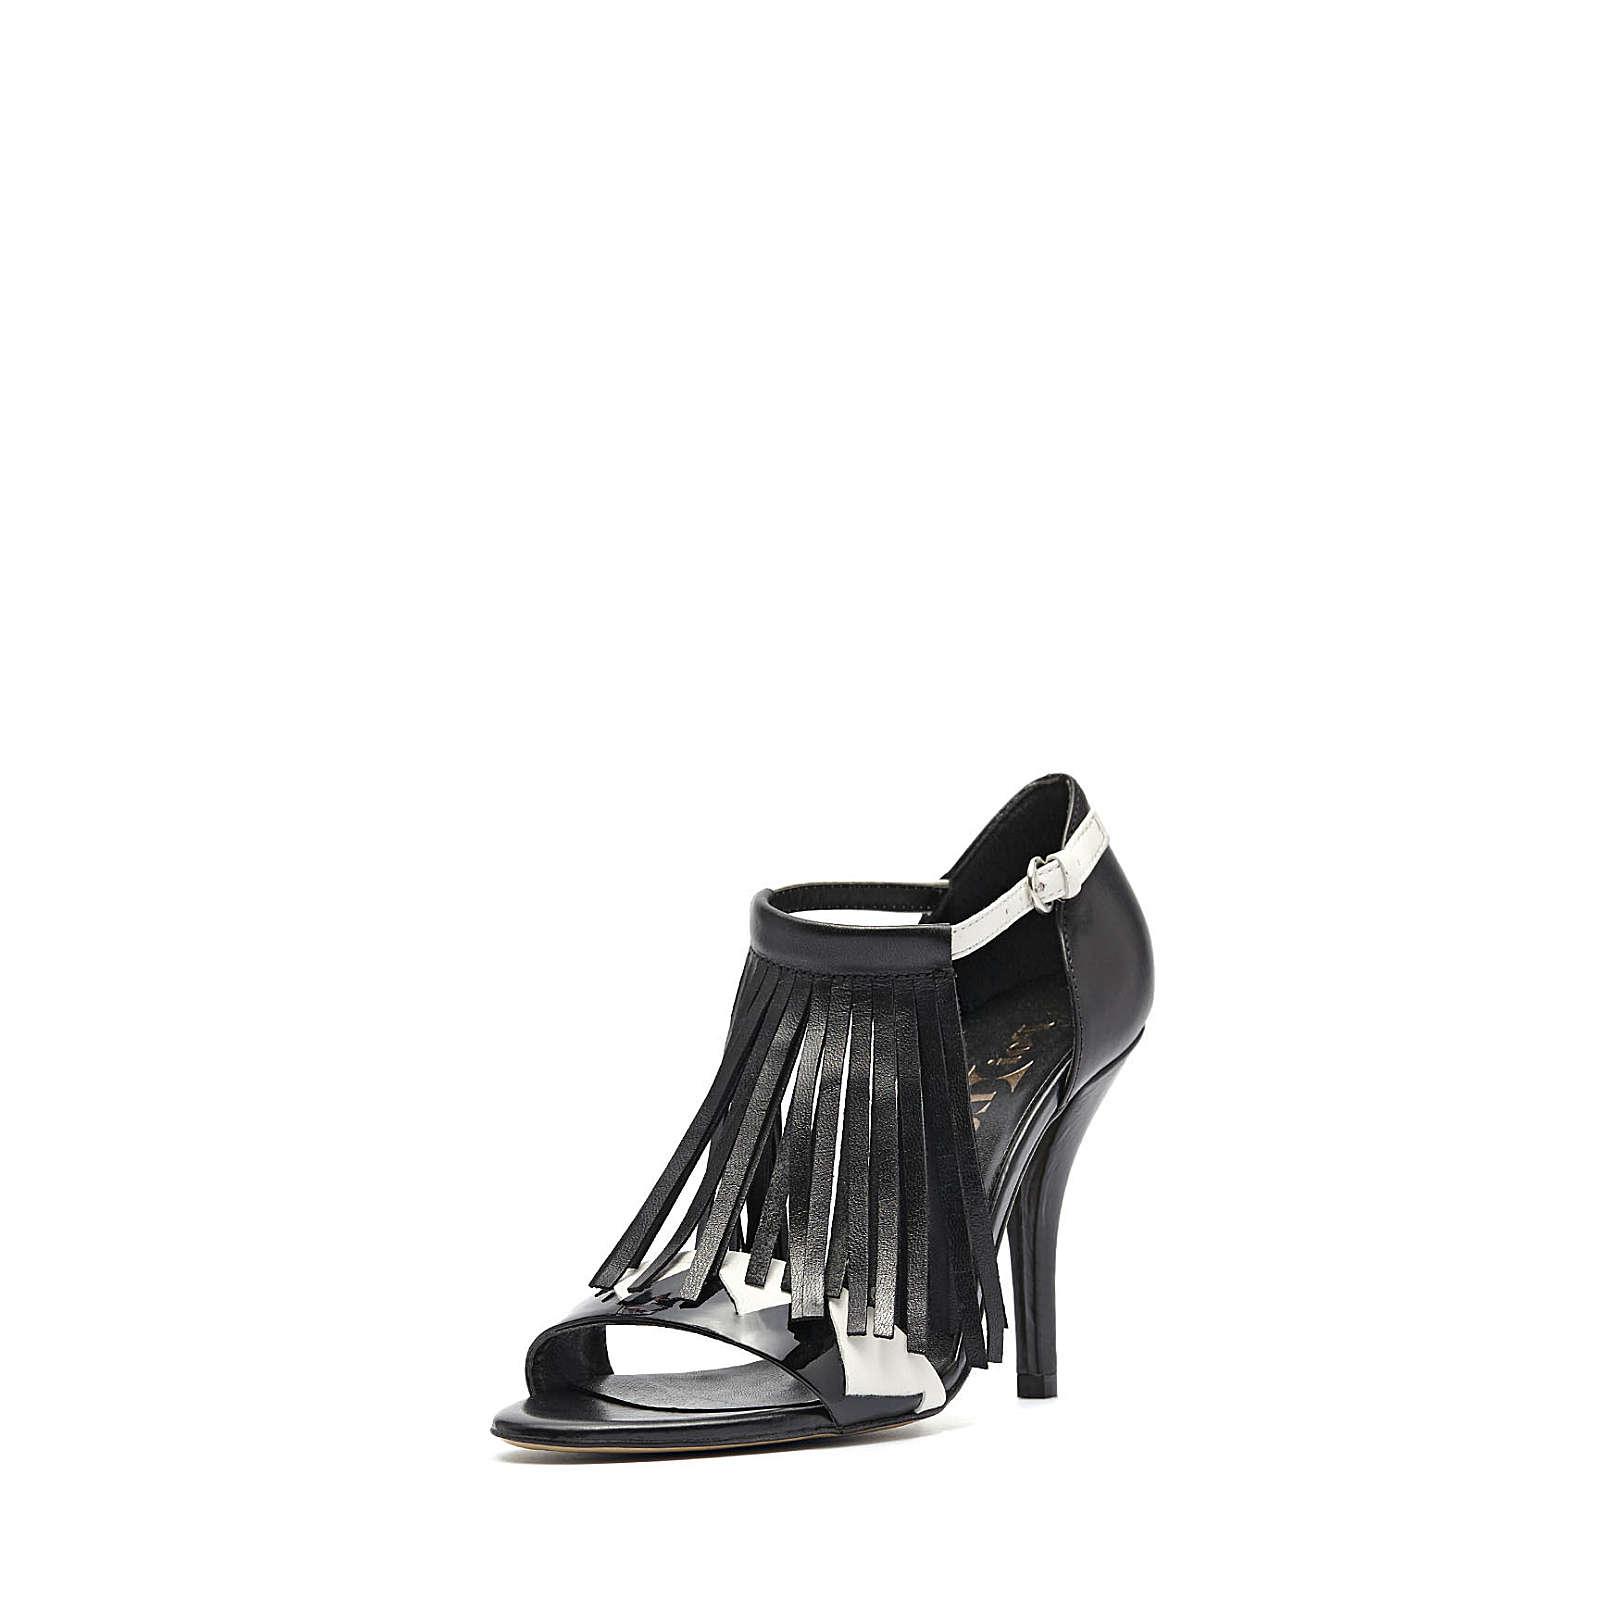 PoiLei Fransen Sandalette Ria Klassische Sandaletten schwarz Damen Gr. 36